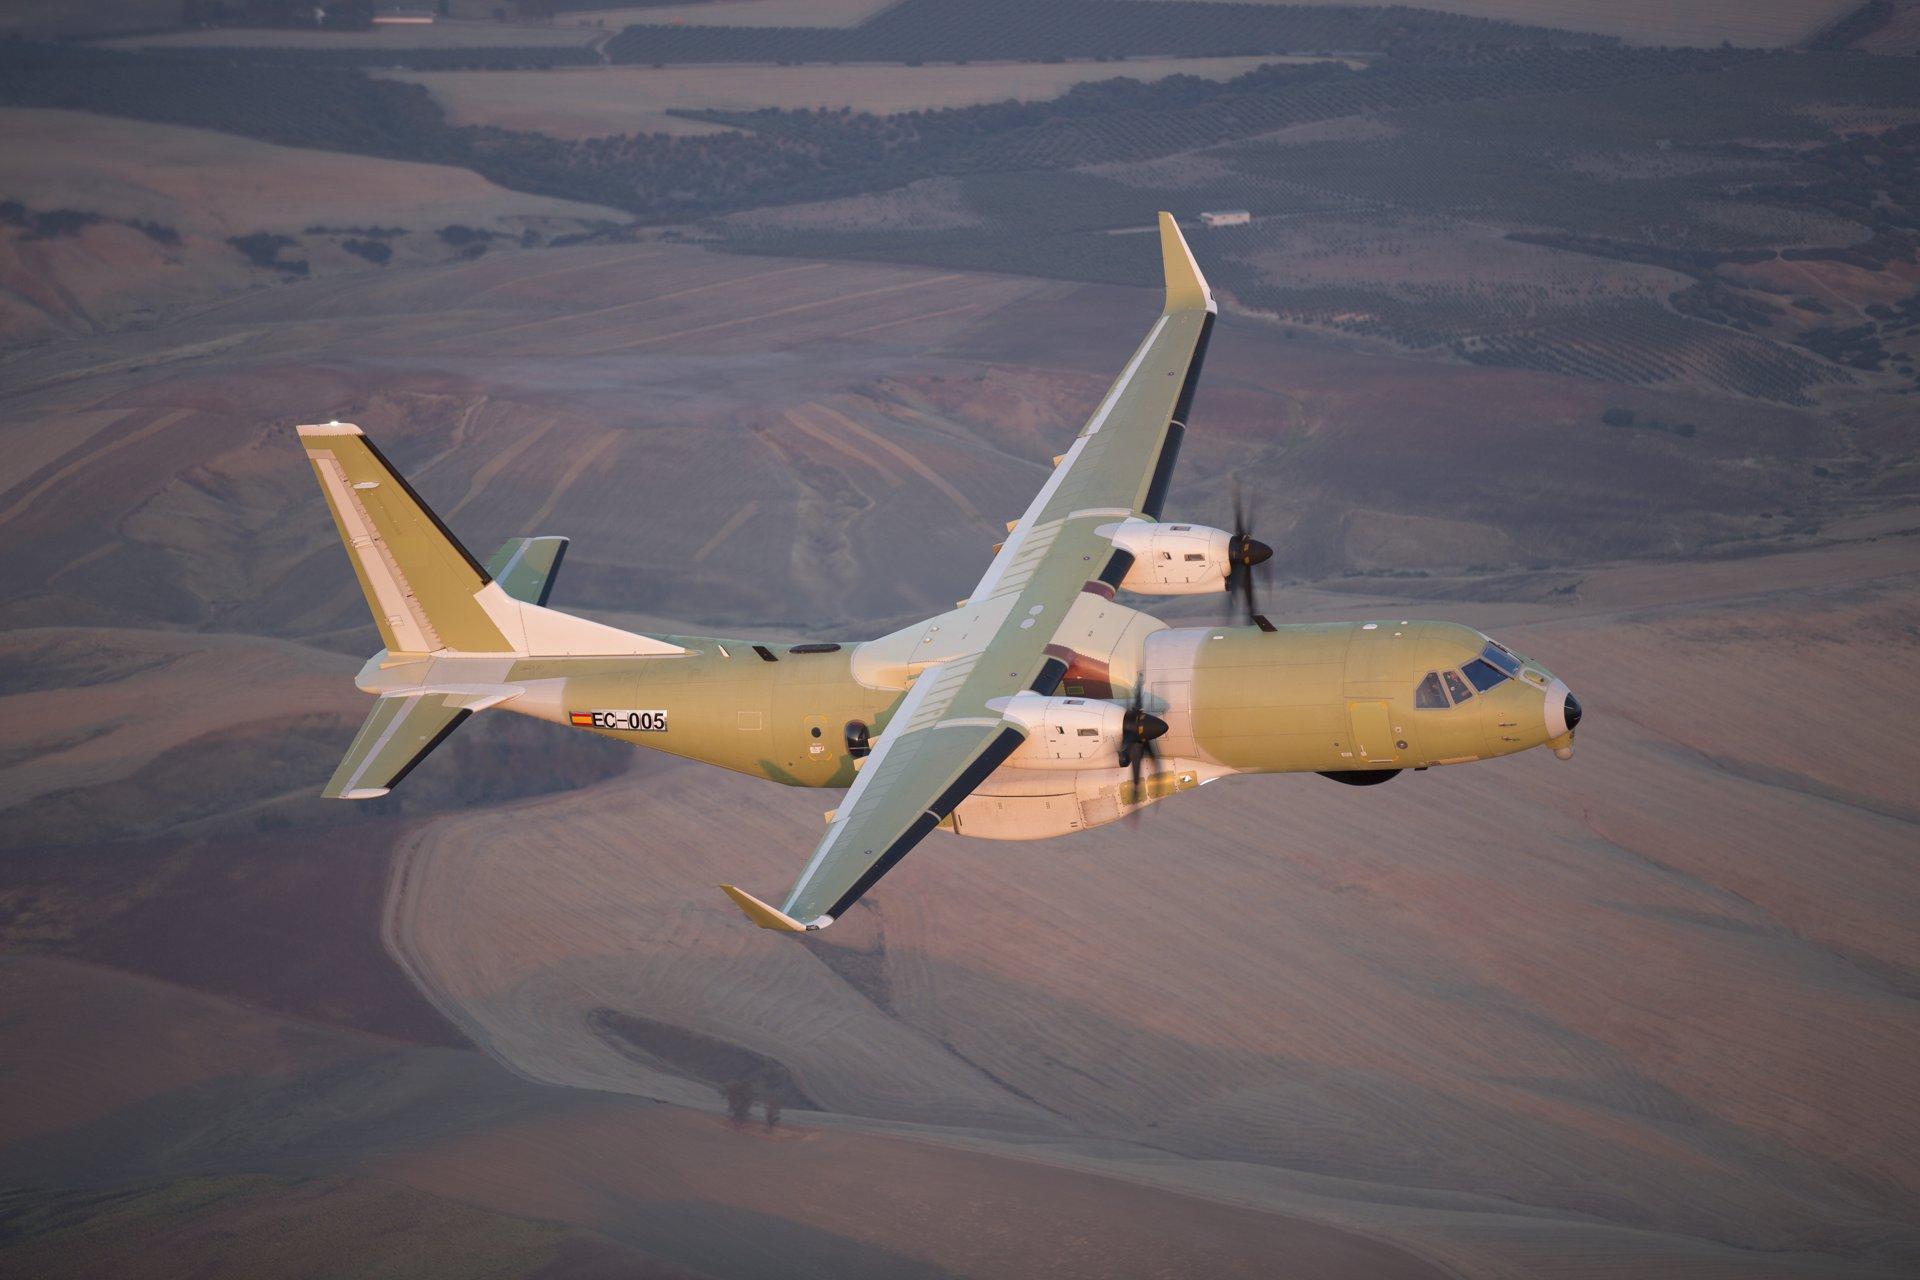 Primer Royal Canadian Air Force C295 hace su vuelo inaugural